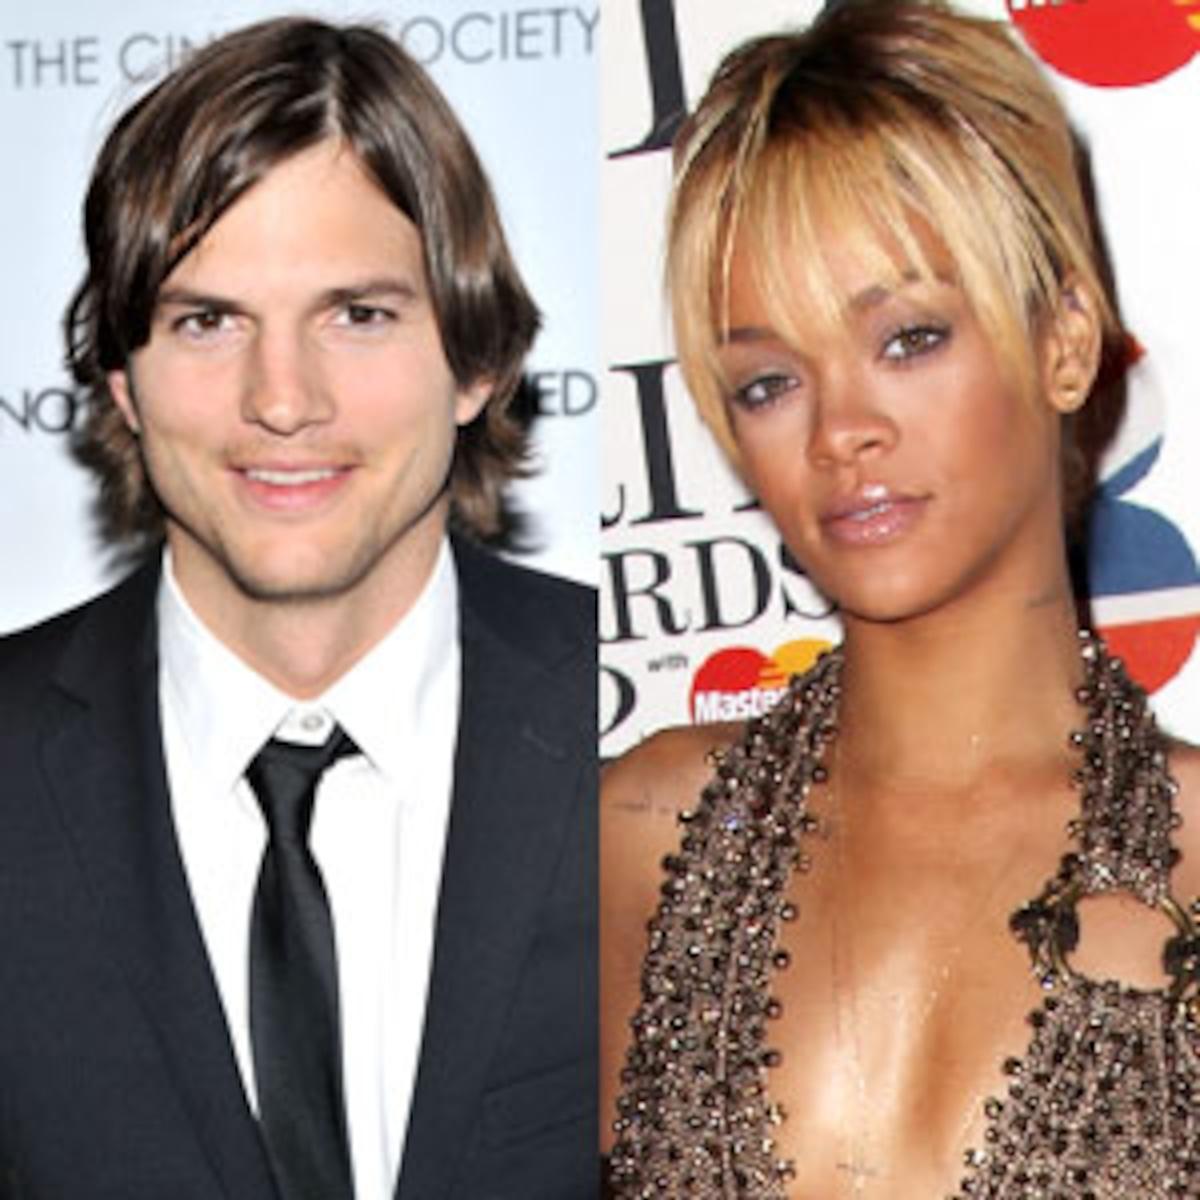 Ashton kutcher is dating rihanna online dating simulations